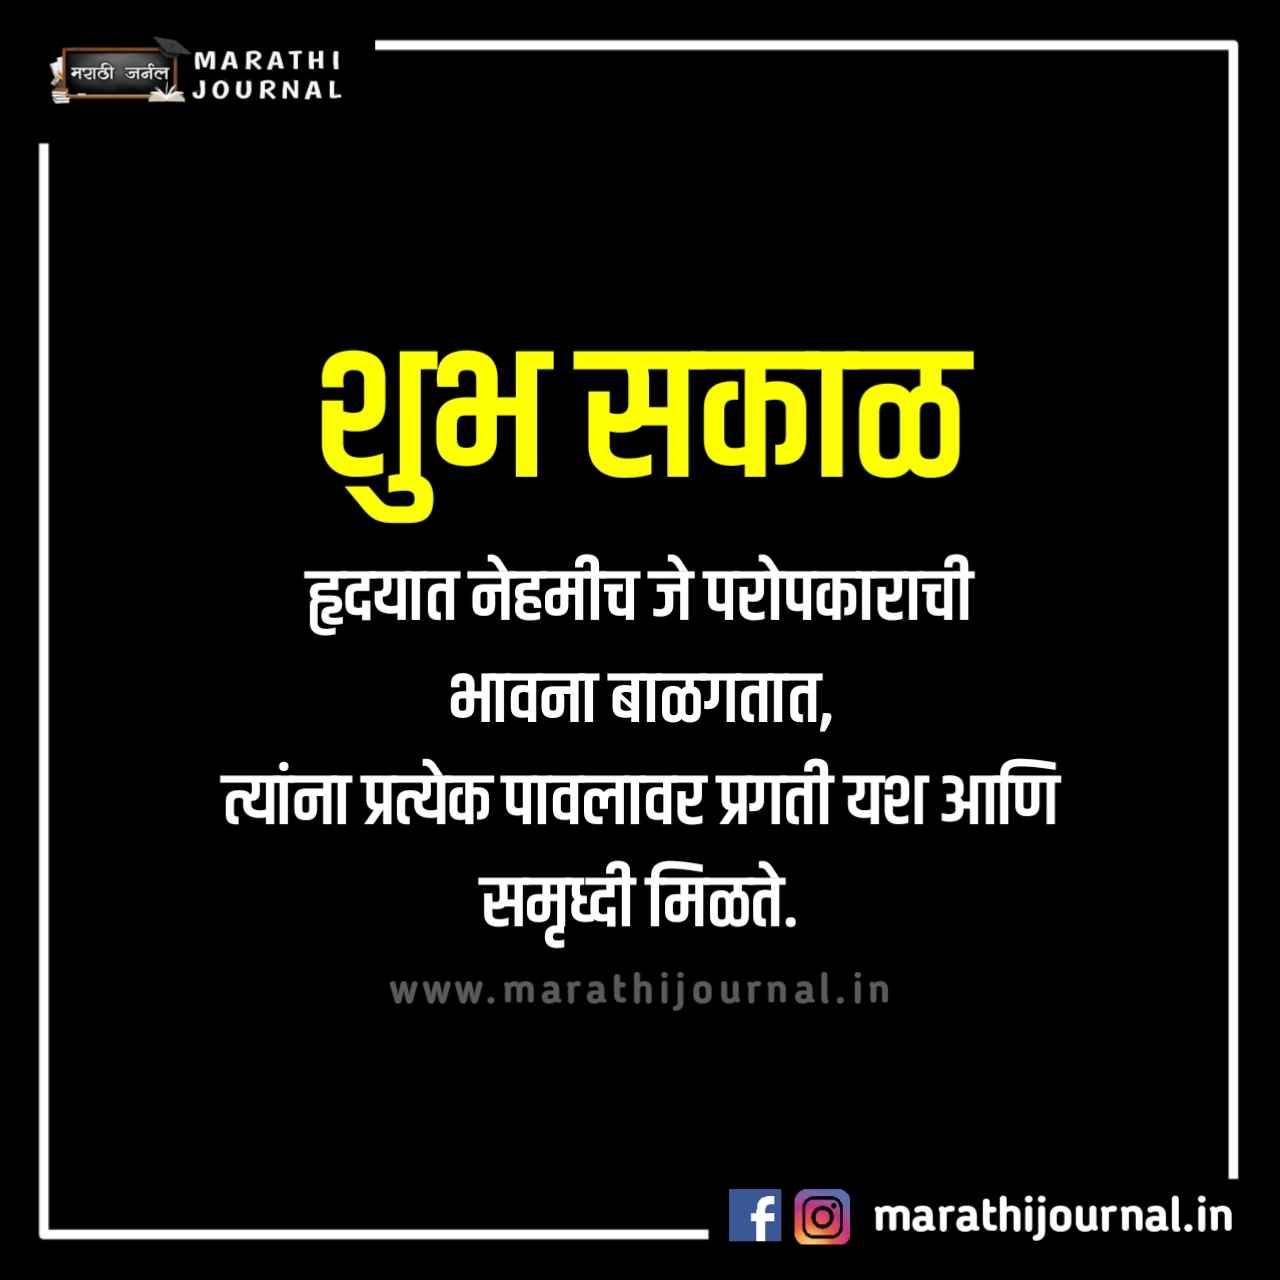 Shubh Sakal, Good Morning Quotes Marathi, शुभ सकाळ, शुभ सकाळ सुविचार, शुभ सकाळ शुभेच्छा, सुप्रभात फोटो मराठी, Good Morning message in Marathi, Good Morning in Marathiathi, Good Morning Marathi Quotes, Good Morning Marathi, सुप्रभात संदेश मराठी, Good Morning Marathi sms, Good Morning Message in Marathi